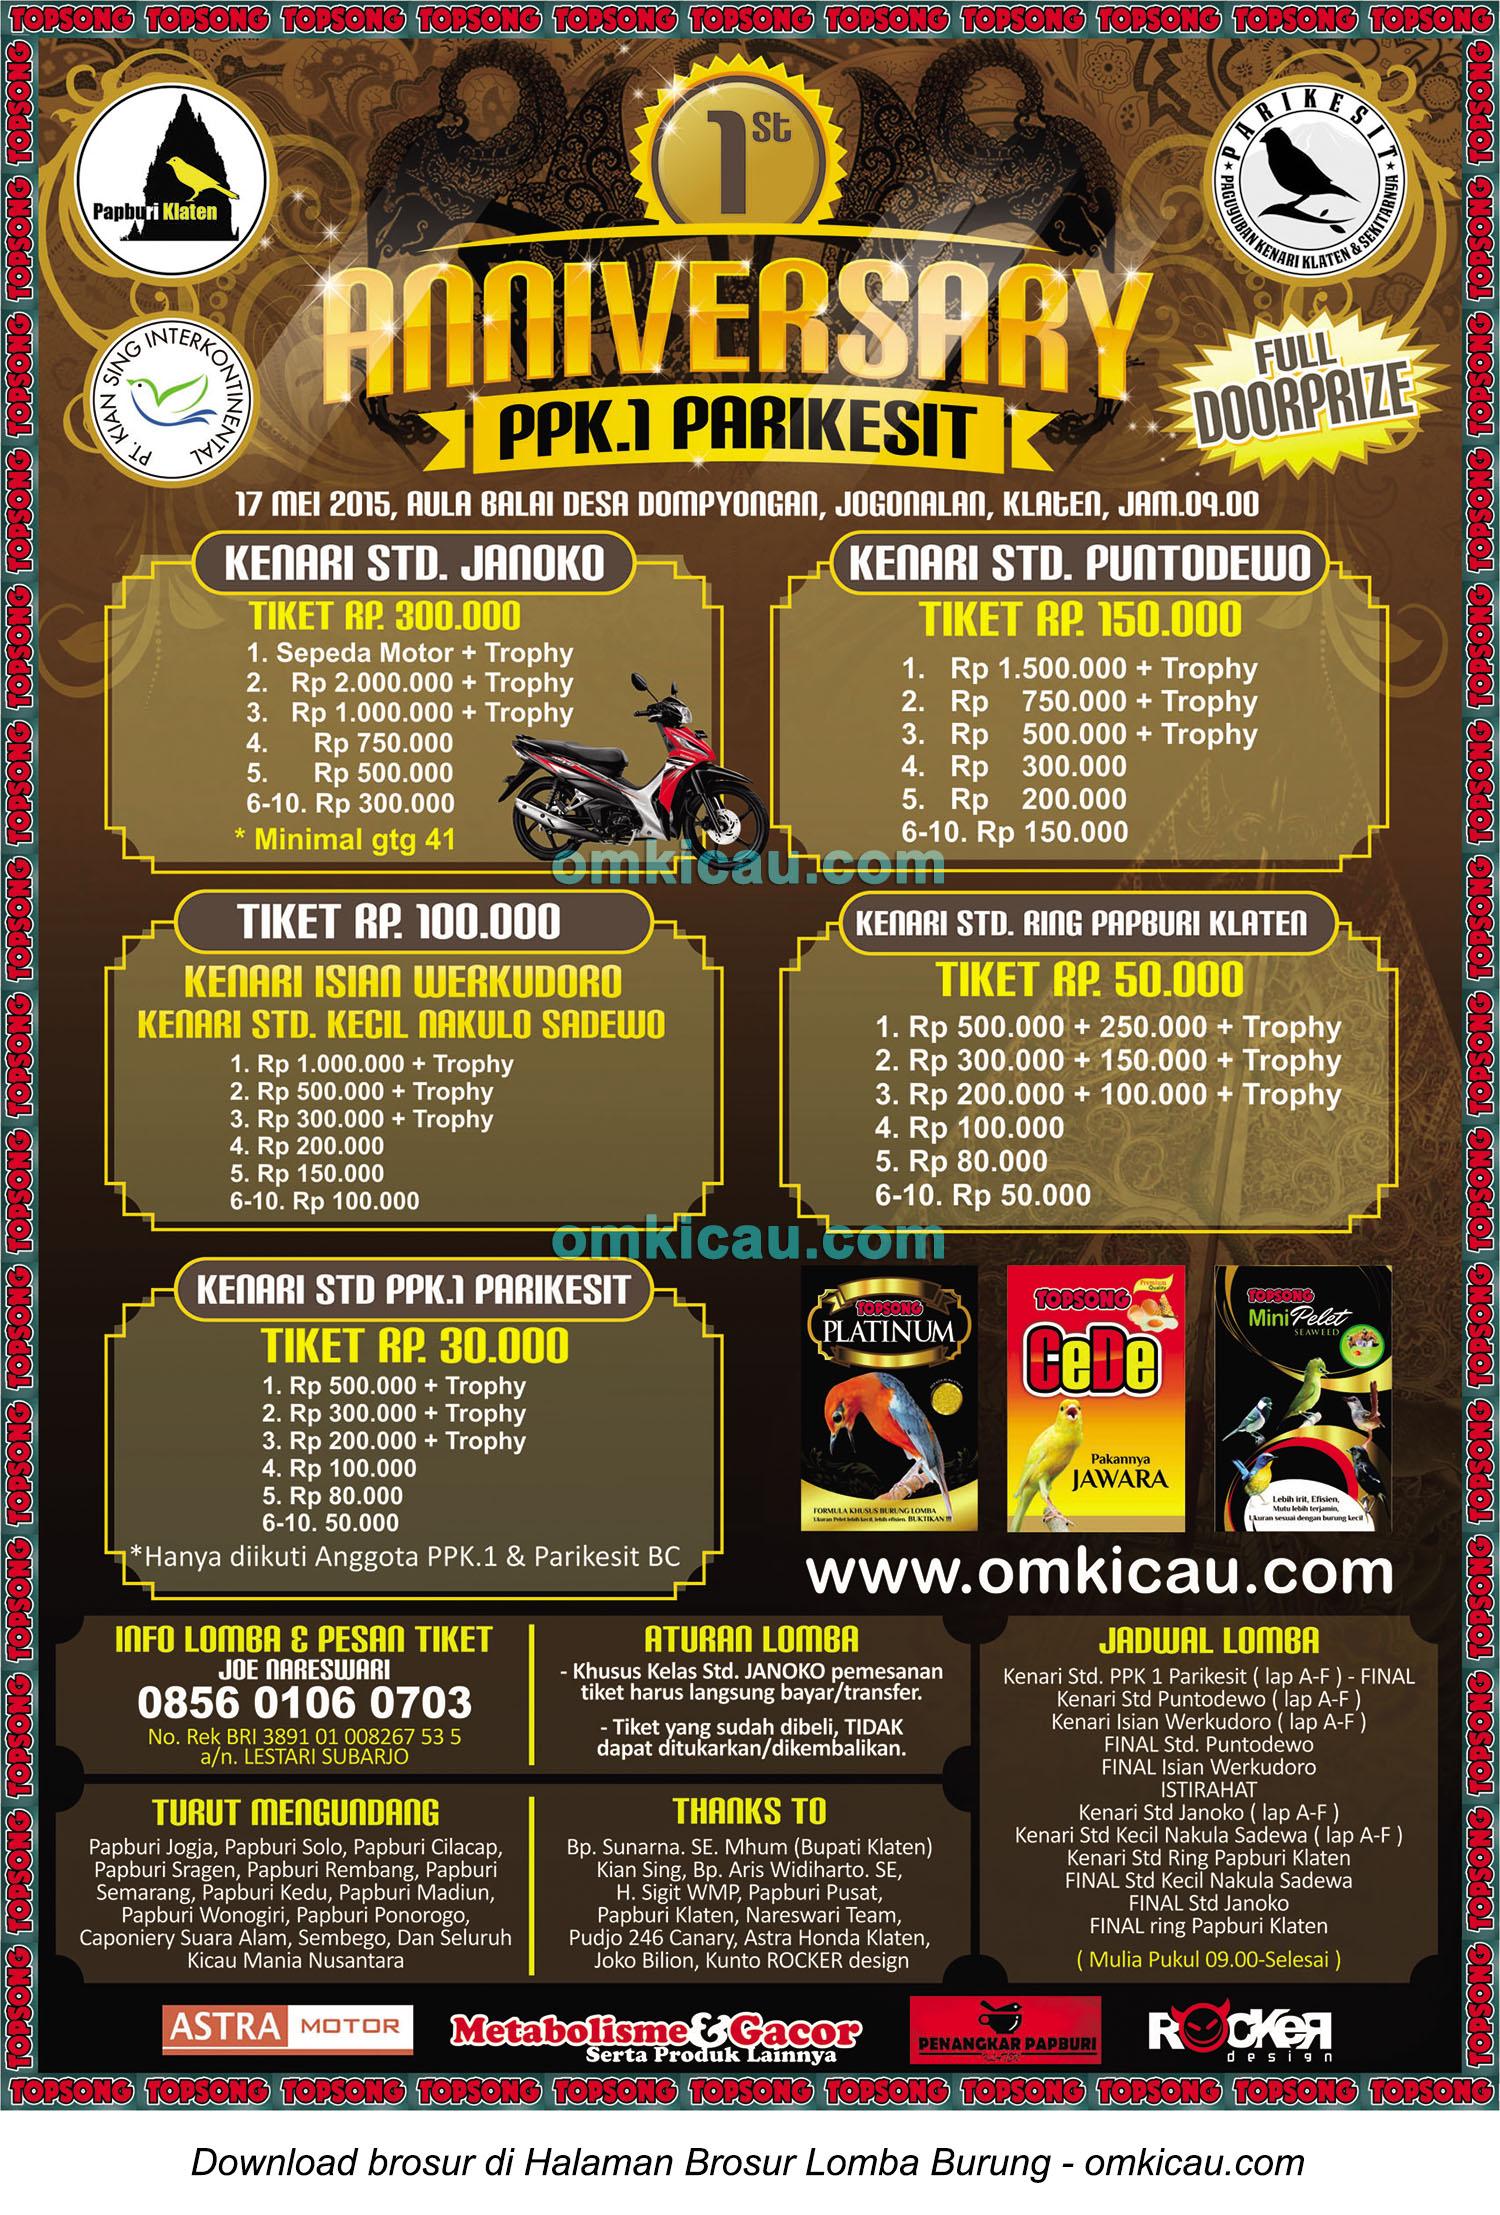 Brosur Kontes Kenari 1st Anniversary PPK1 Parikesit, Klaten, 17 Mei 2015